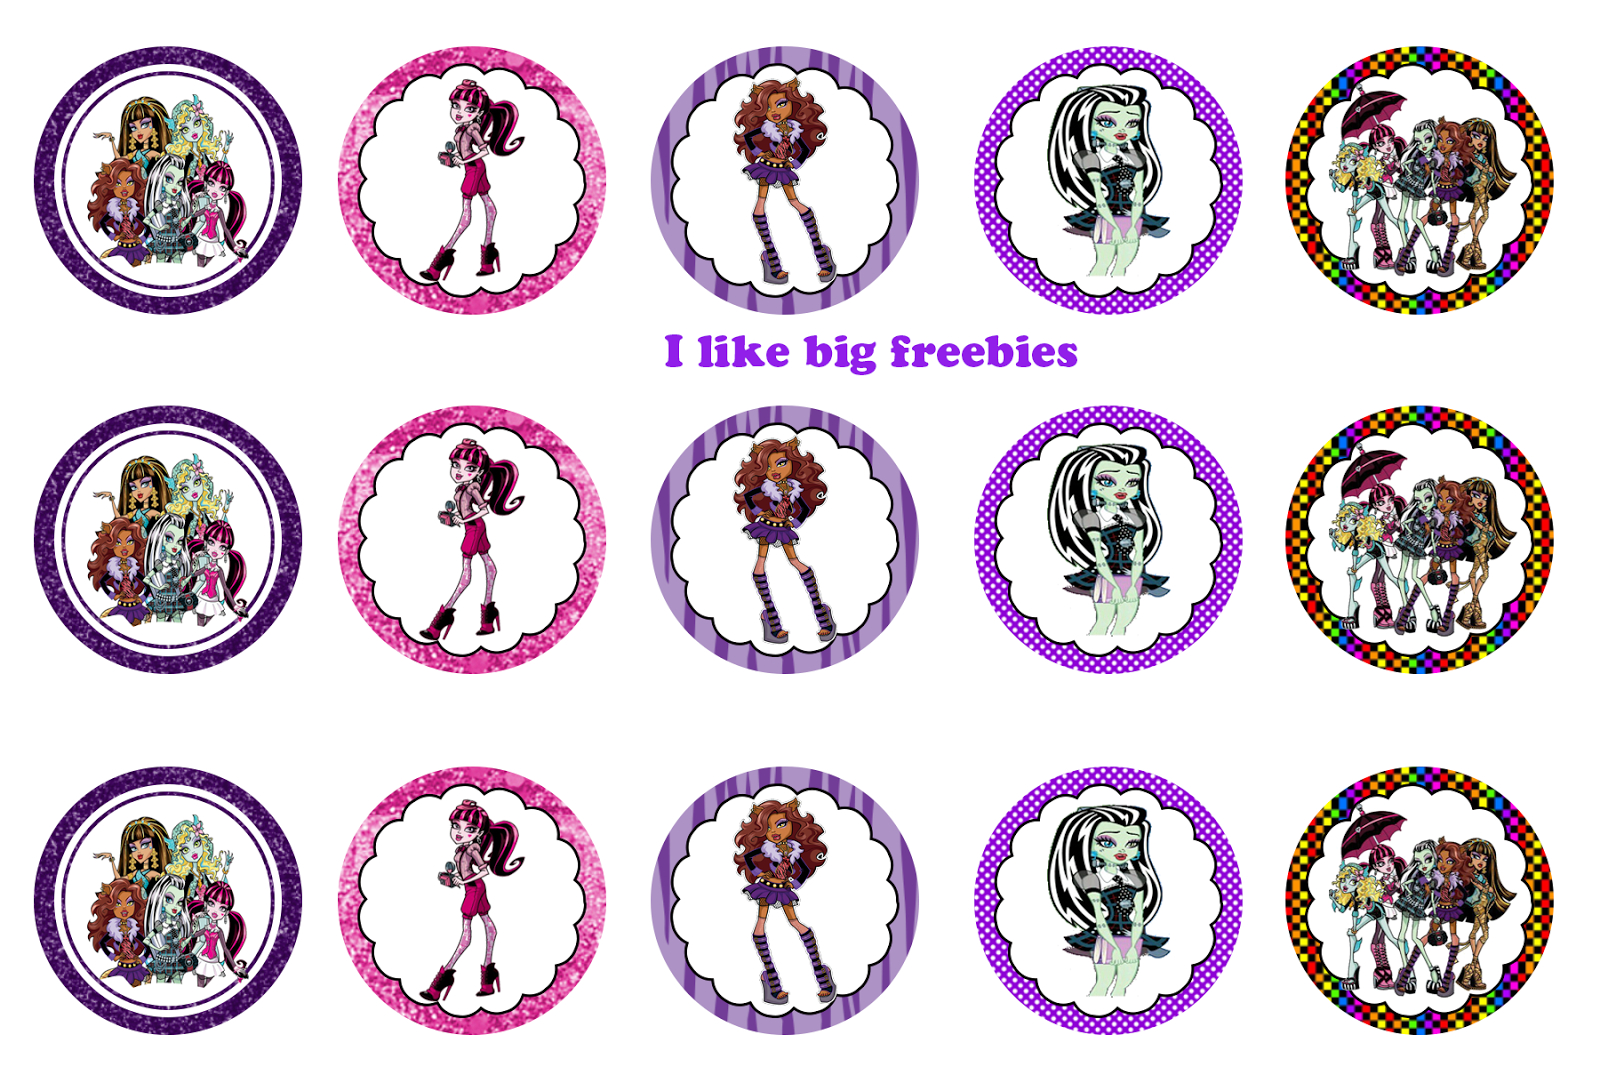 Monster High Free Printables | Free Printable Monster High Cupcake - Monster High Cupcake Toppers Printable Free